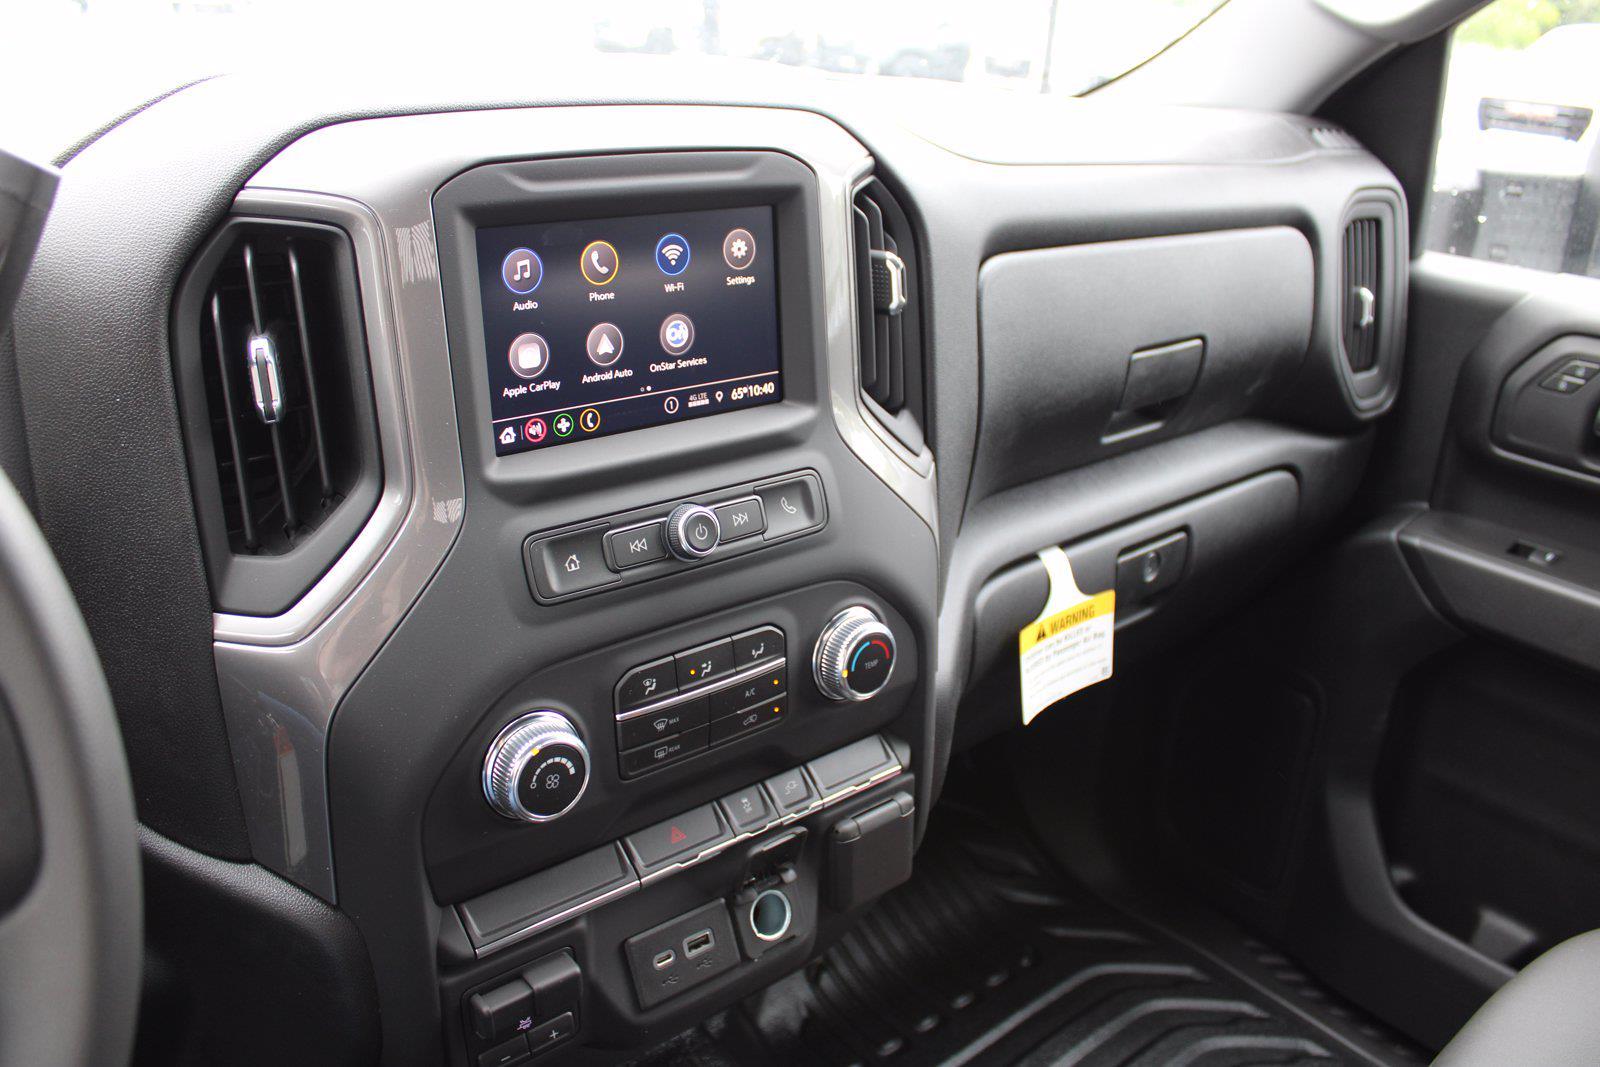 2021 GMC Sierra 3500 Regular Cab 4x4, Dump Body #P21-1003 - photo 13